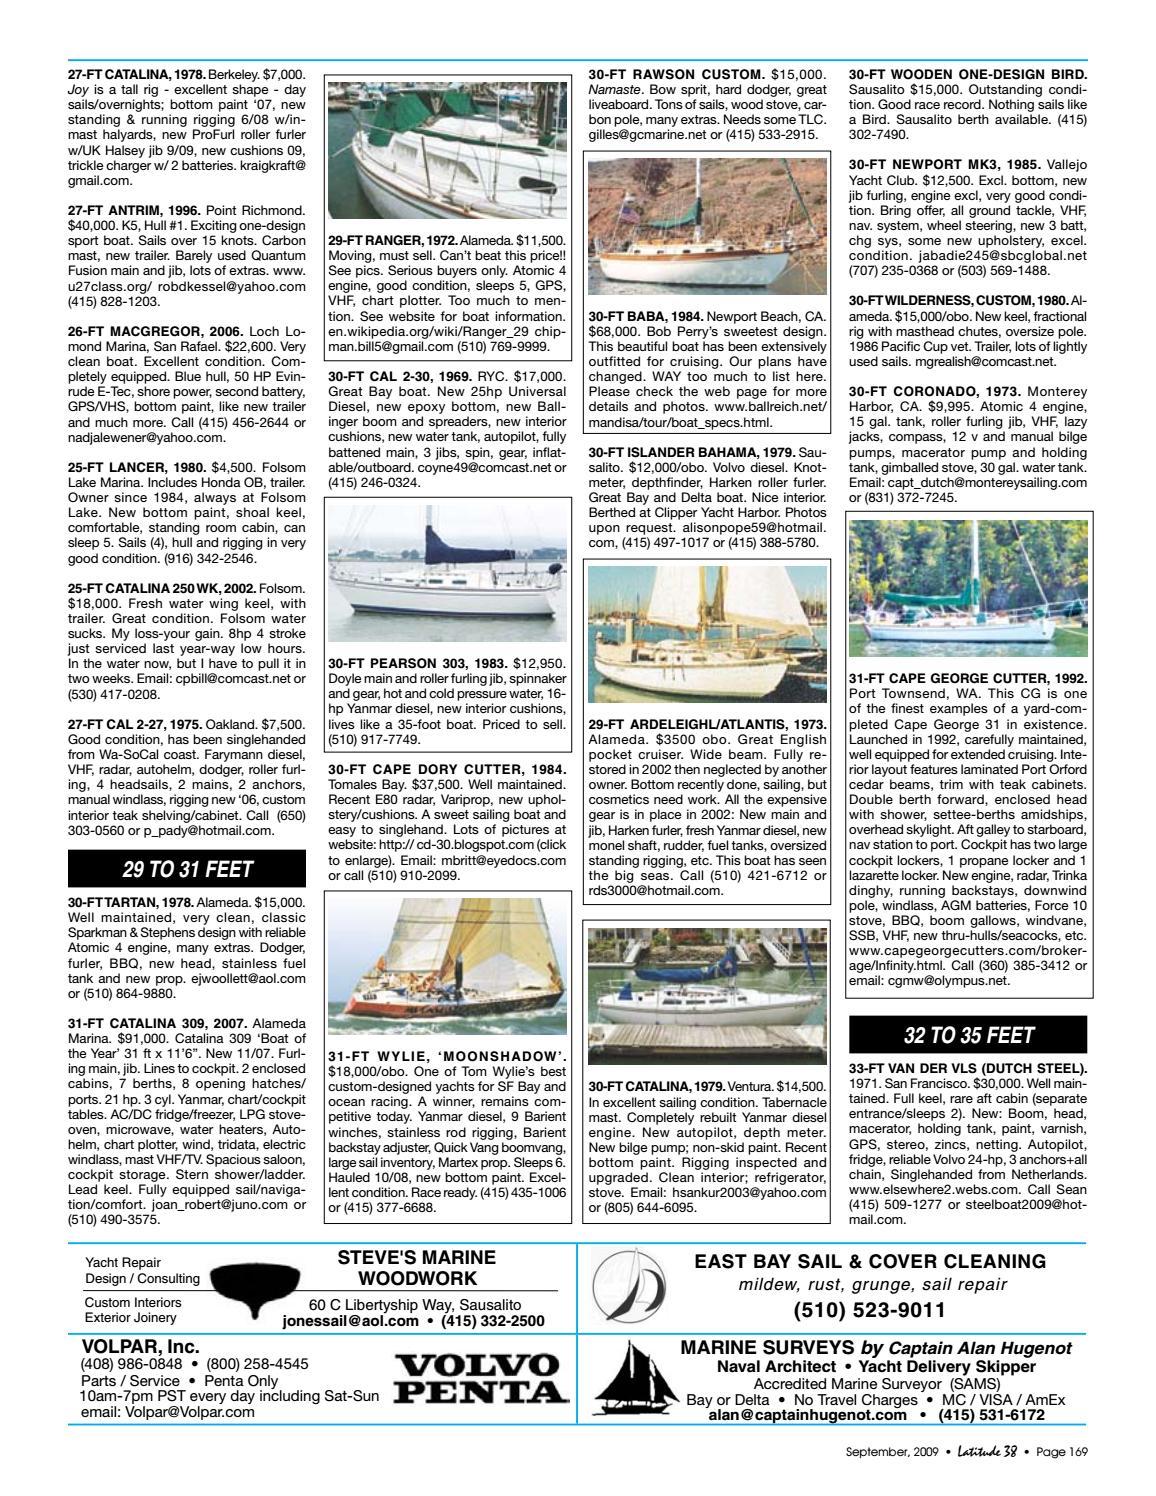 Latitude 38 September 2009 by Latitude 38 Media, LLC - issuu